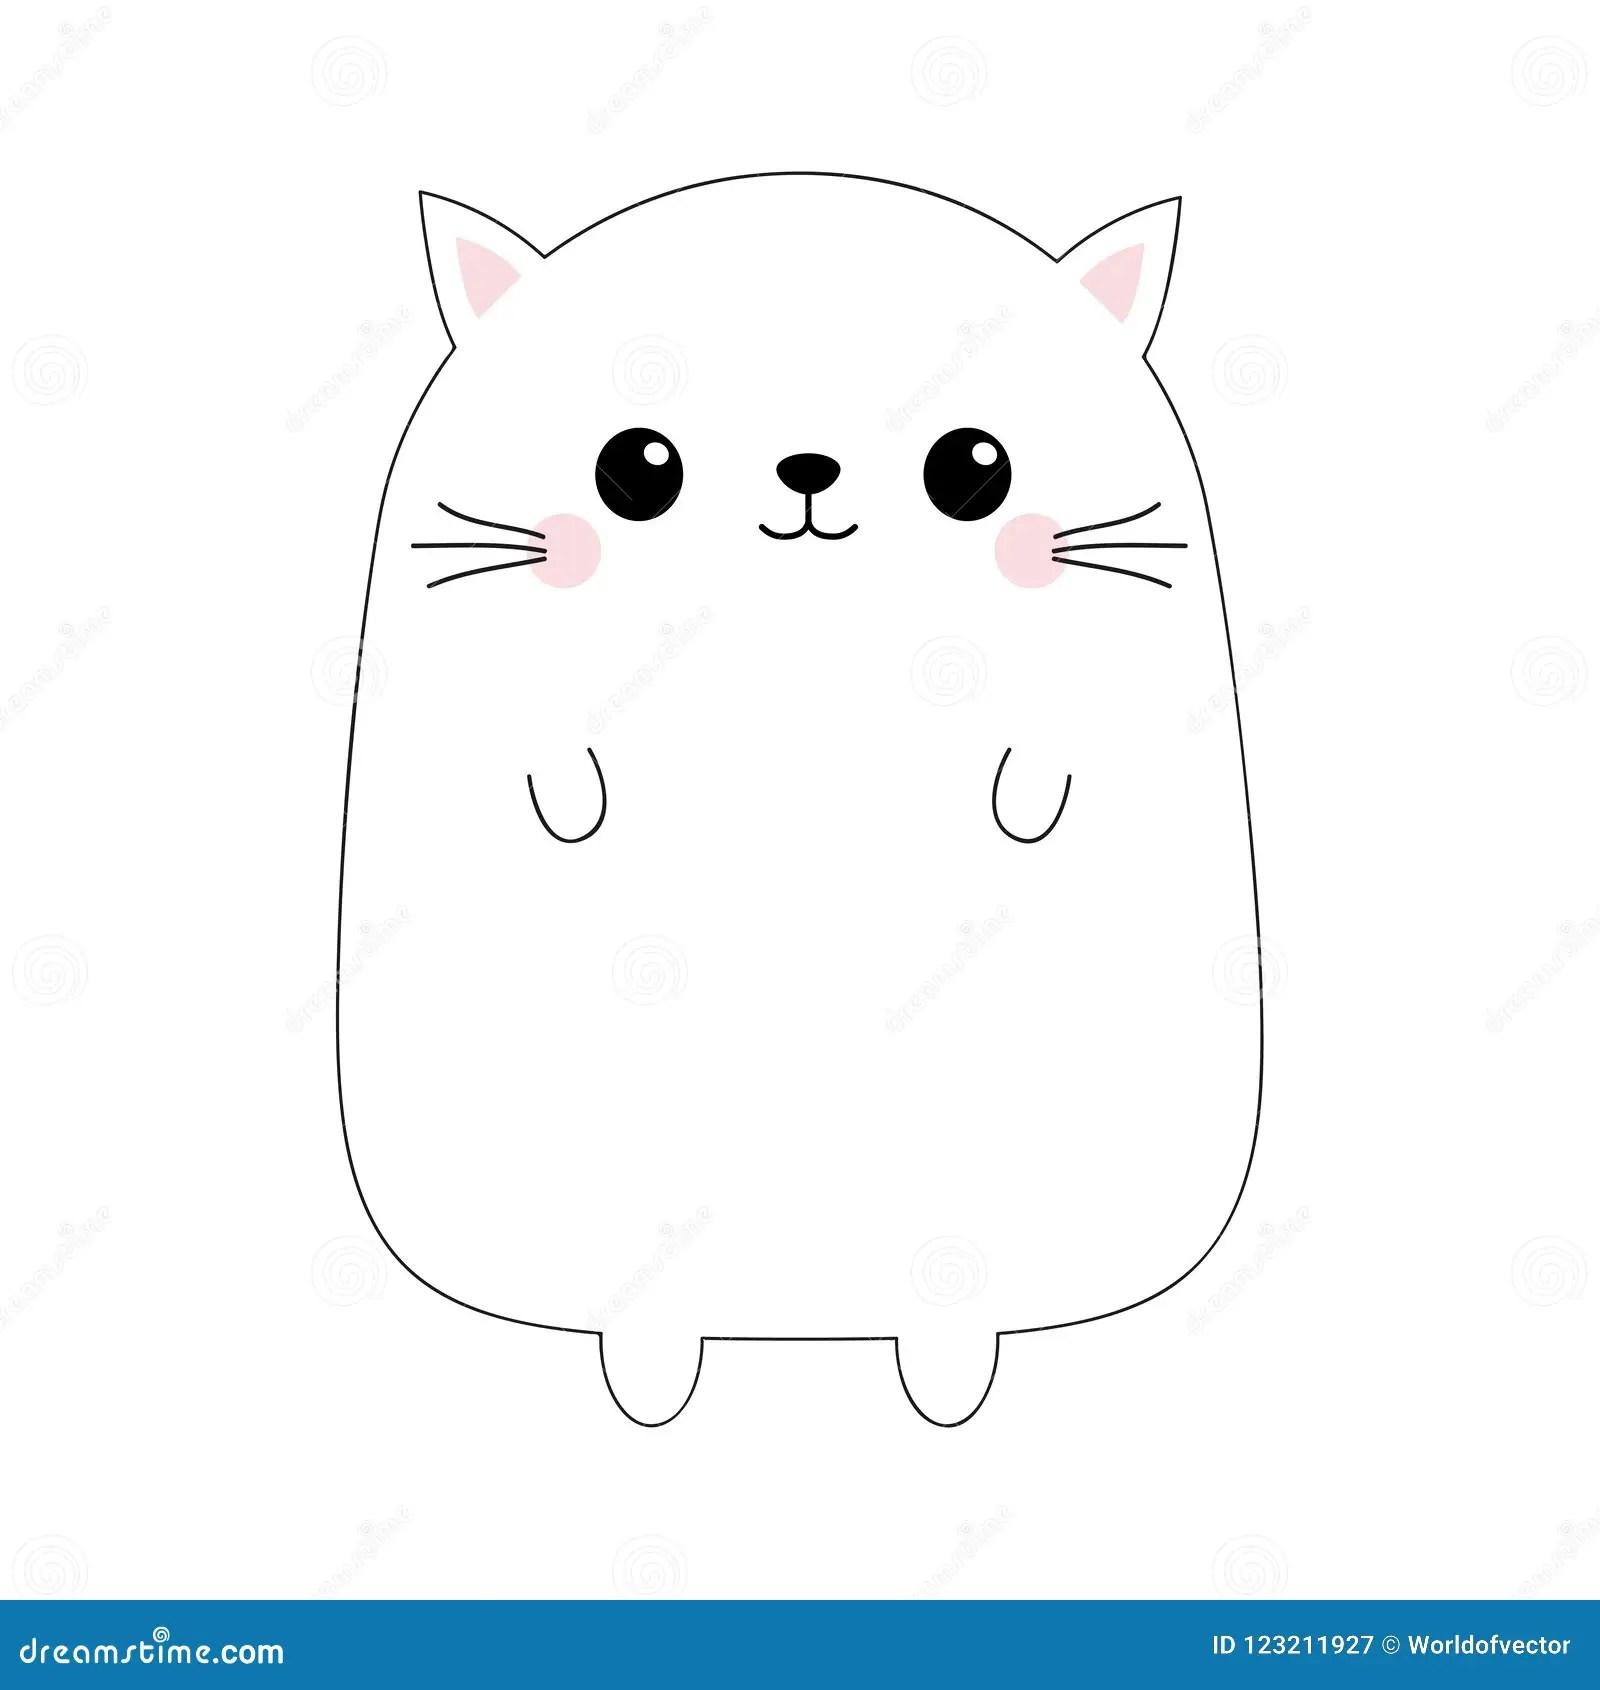 Cat Kitty Face Head Body Black Contour Silhouette Doodle